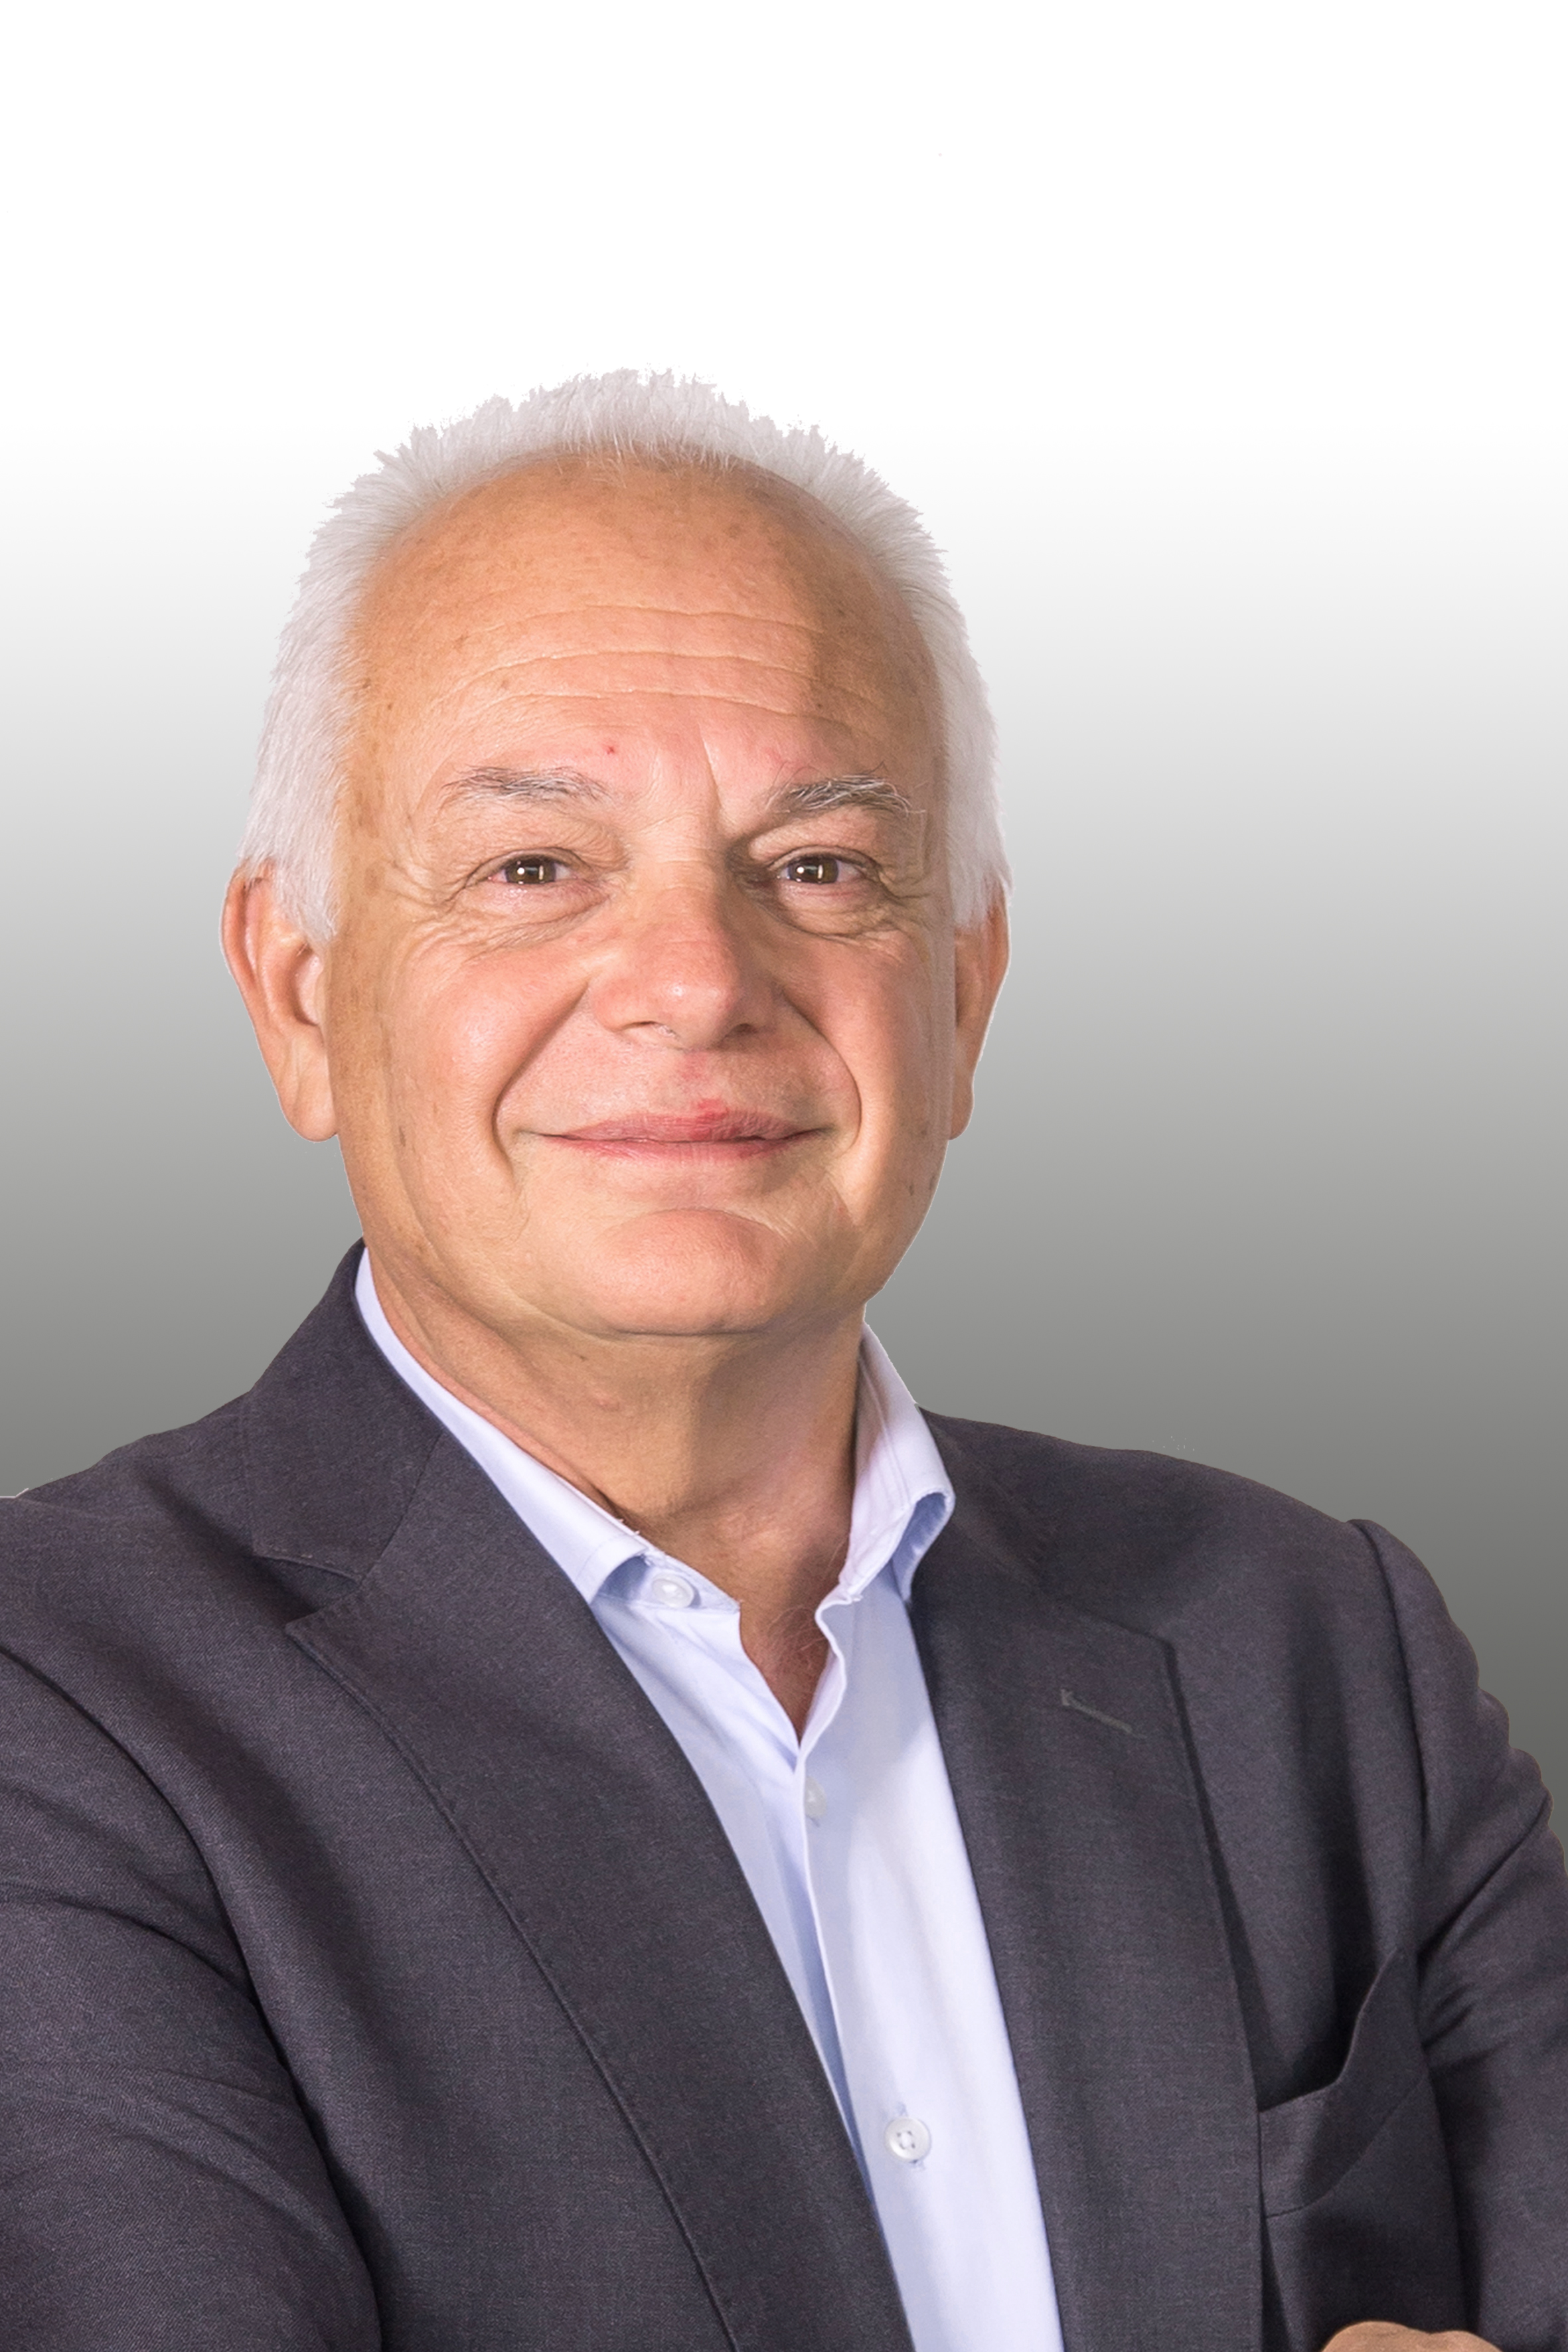 Philippe SUMEIRE